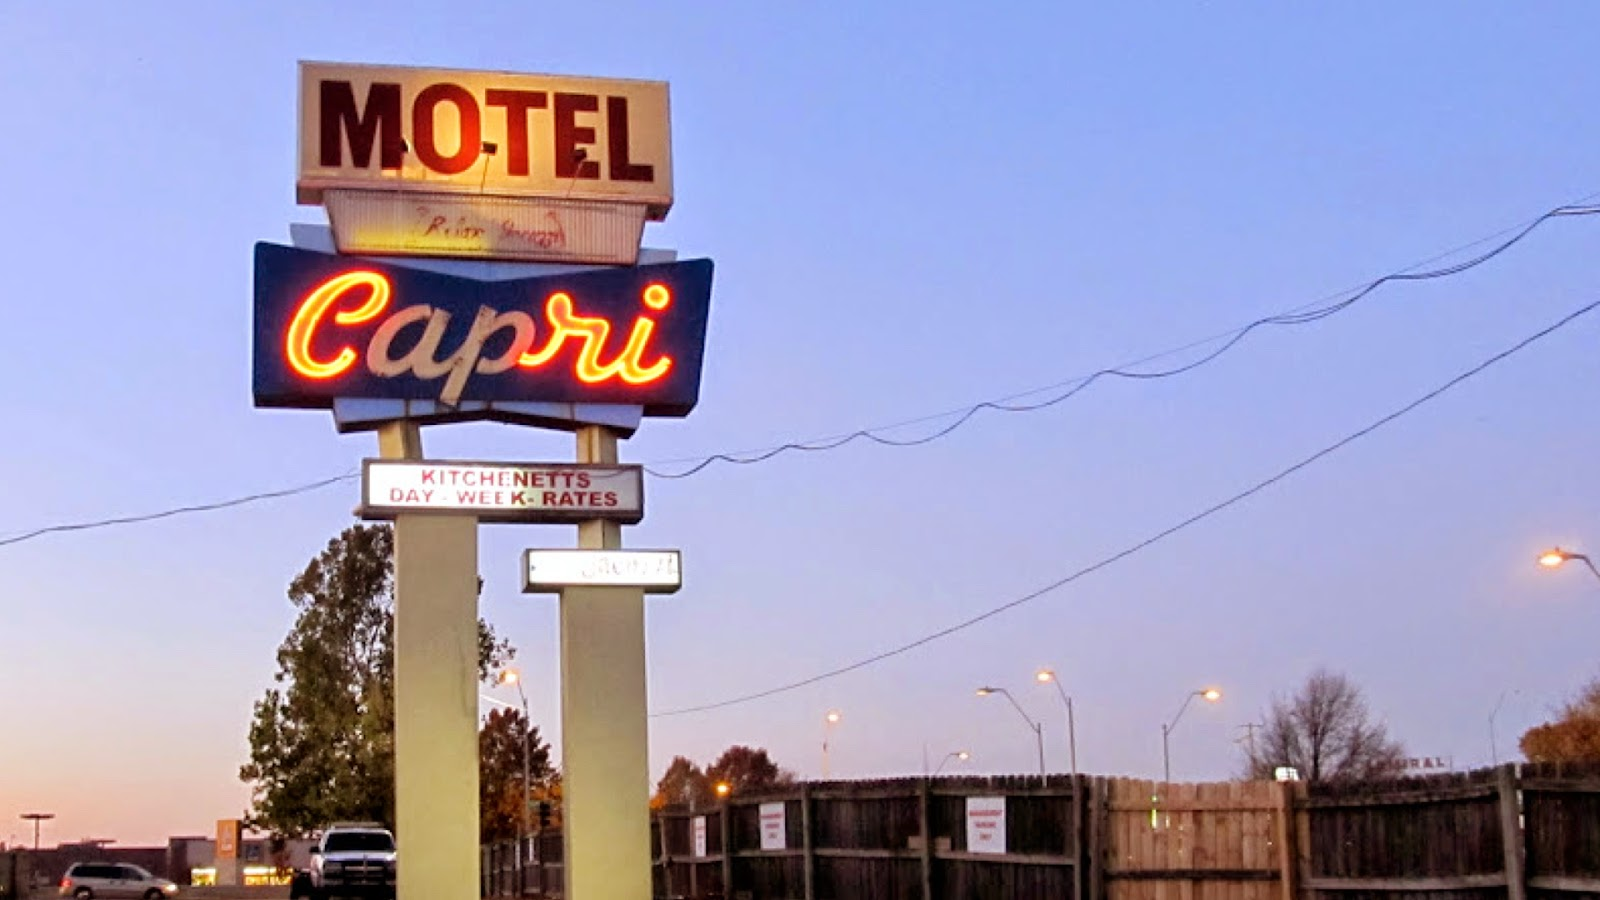 Capri Hotel Kansas City Mo - Bonusslotplaycasino.technology